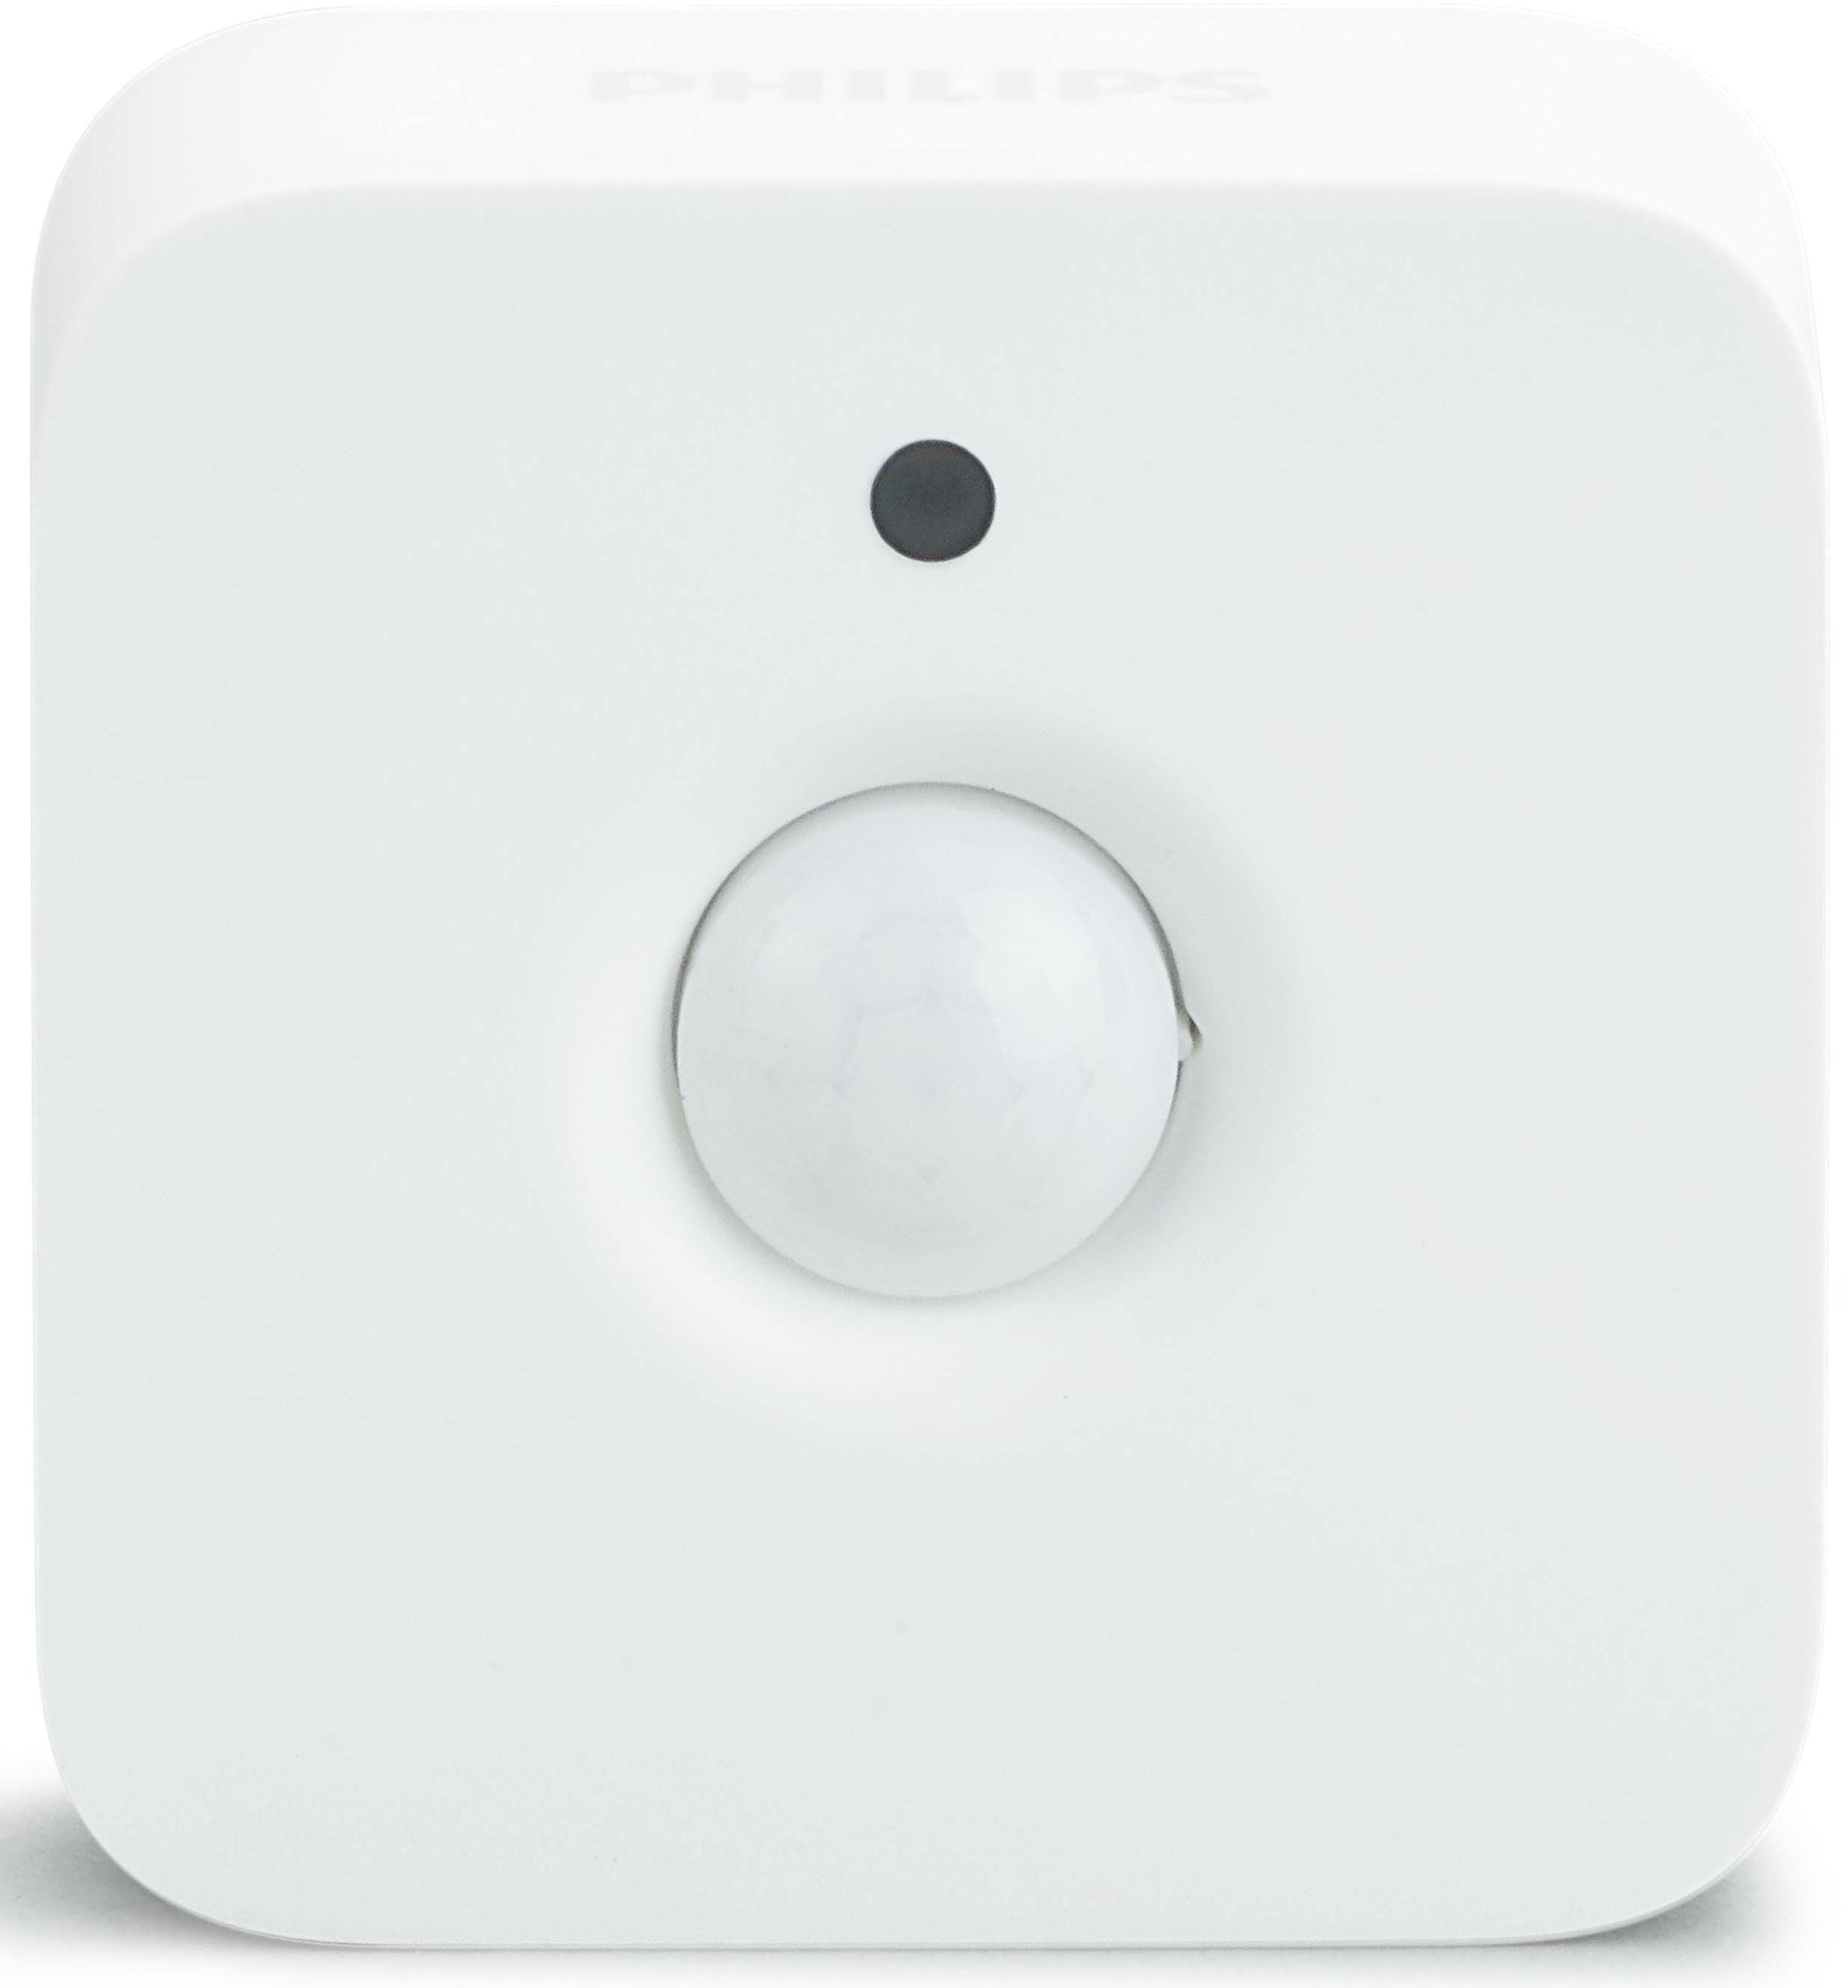 Philips Hue Schalter »Bewegungsmelder«, App-Steuerung